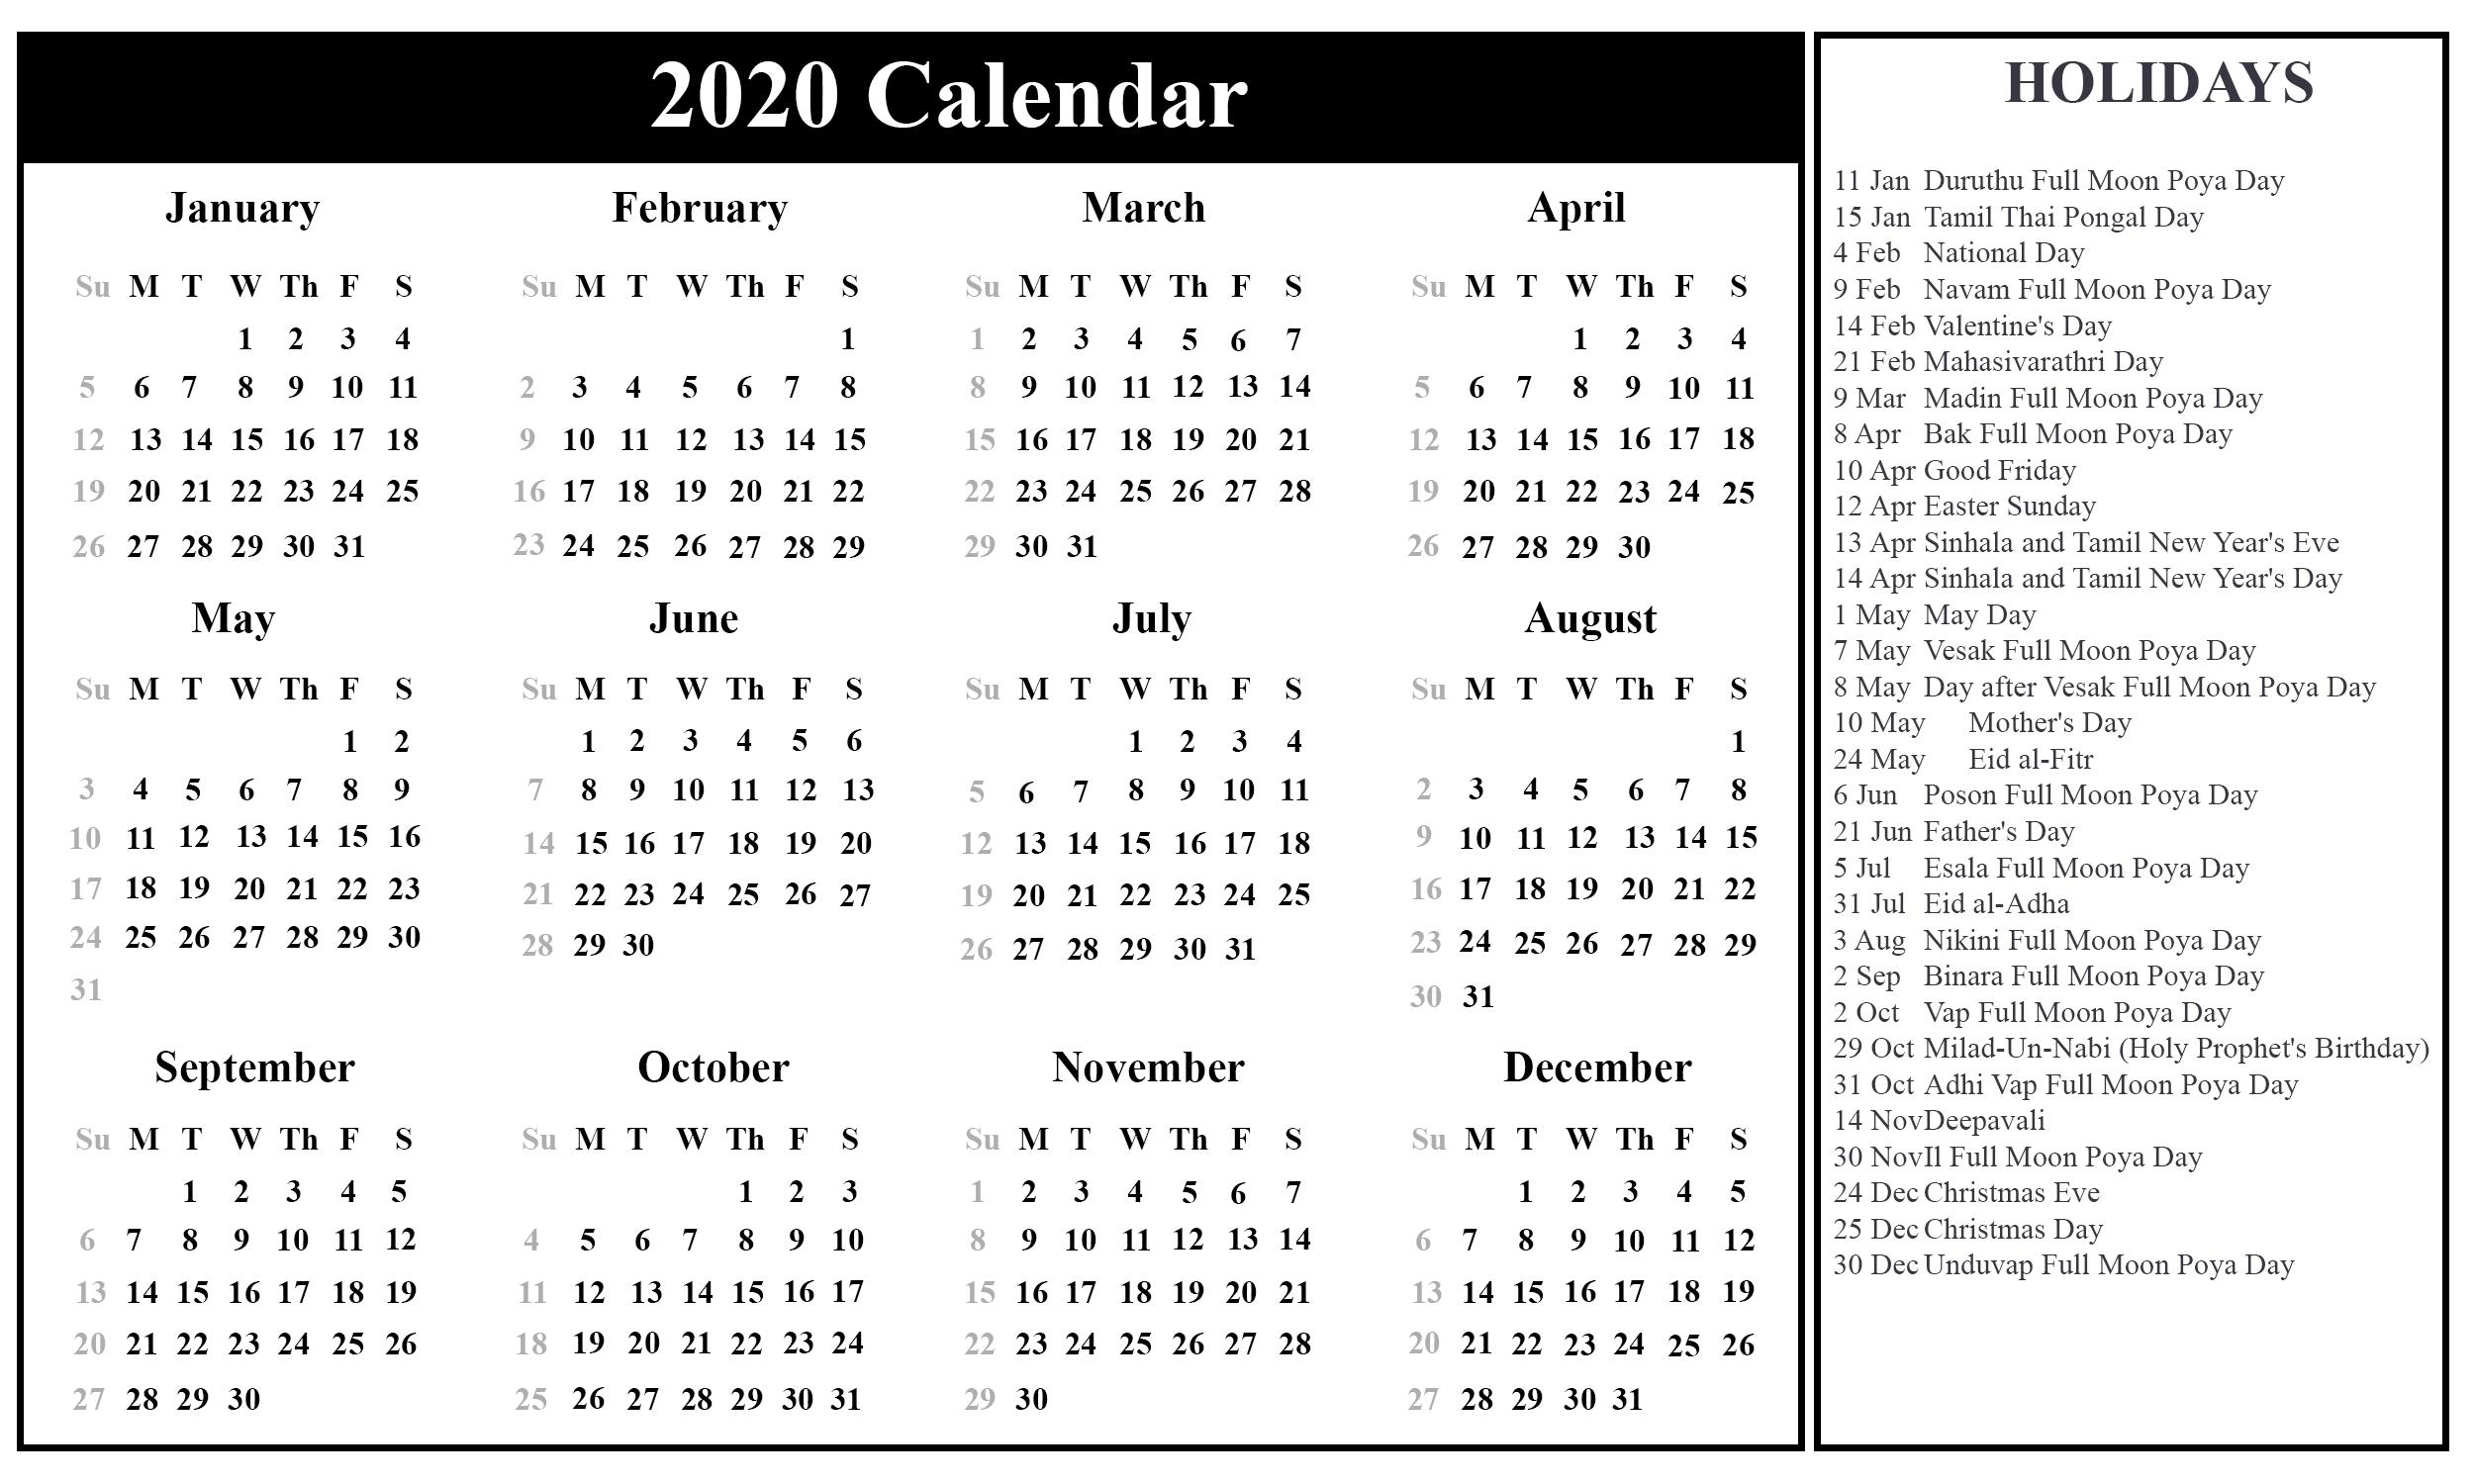 Printable December Calendar Template-Printable Calendar 2020 With Bank Holidays